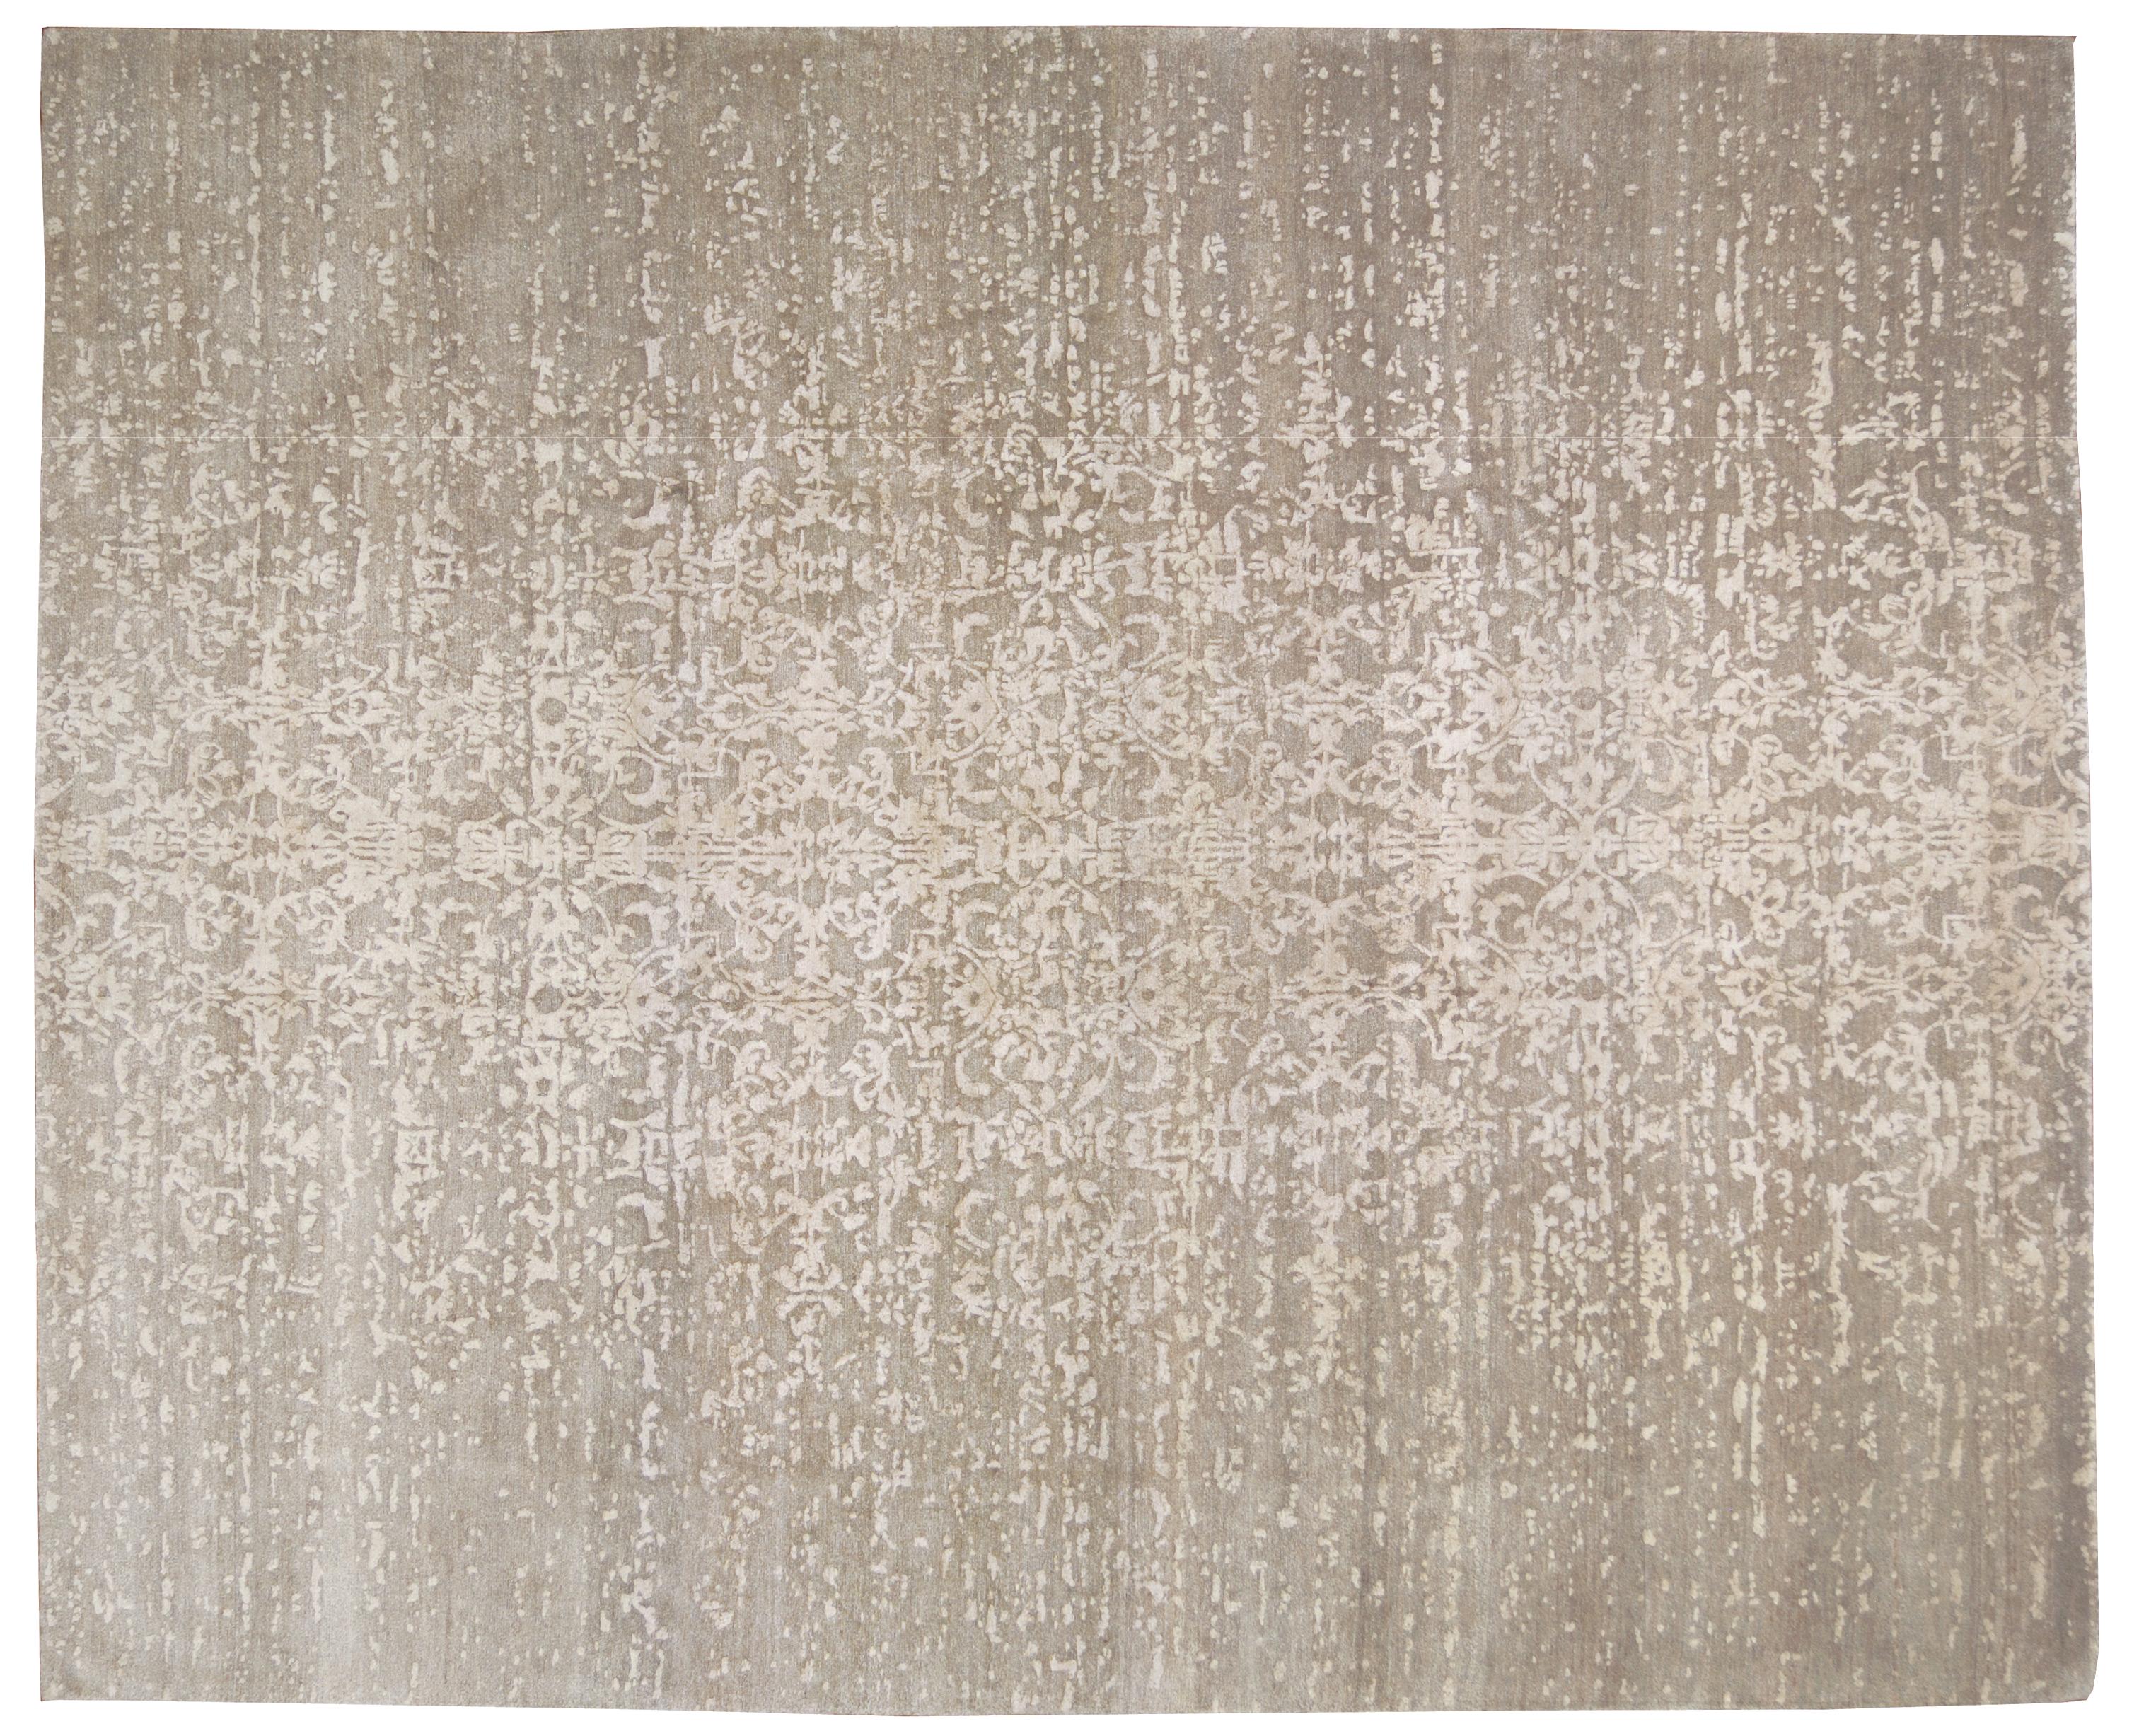 MILANO STOMPED JAN KATH cm 250 x 300 | Morandi Tappeti